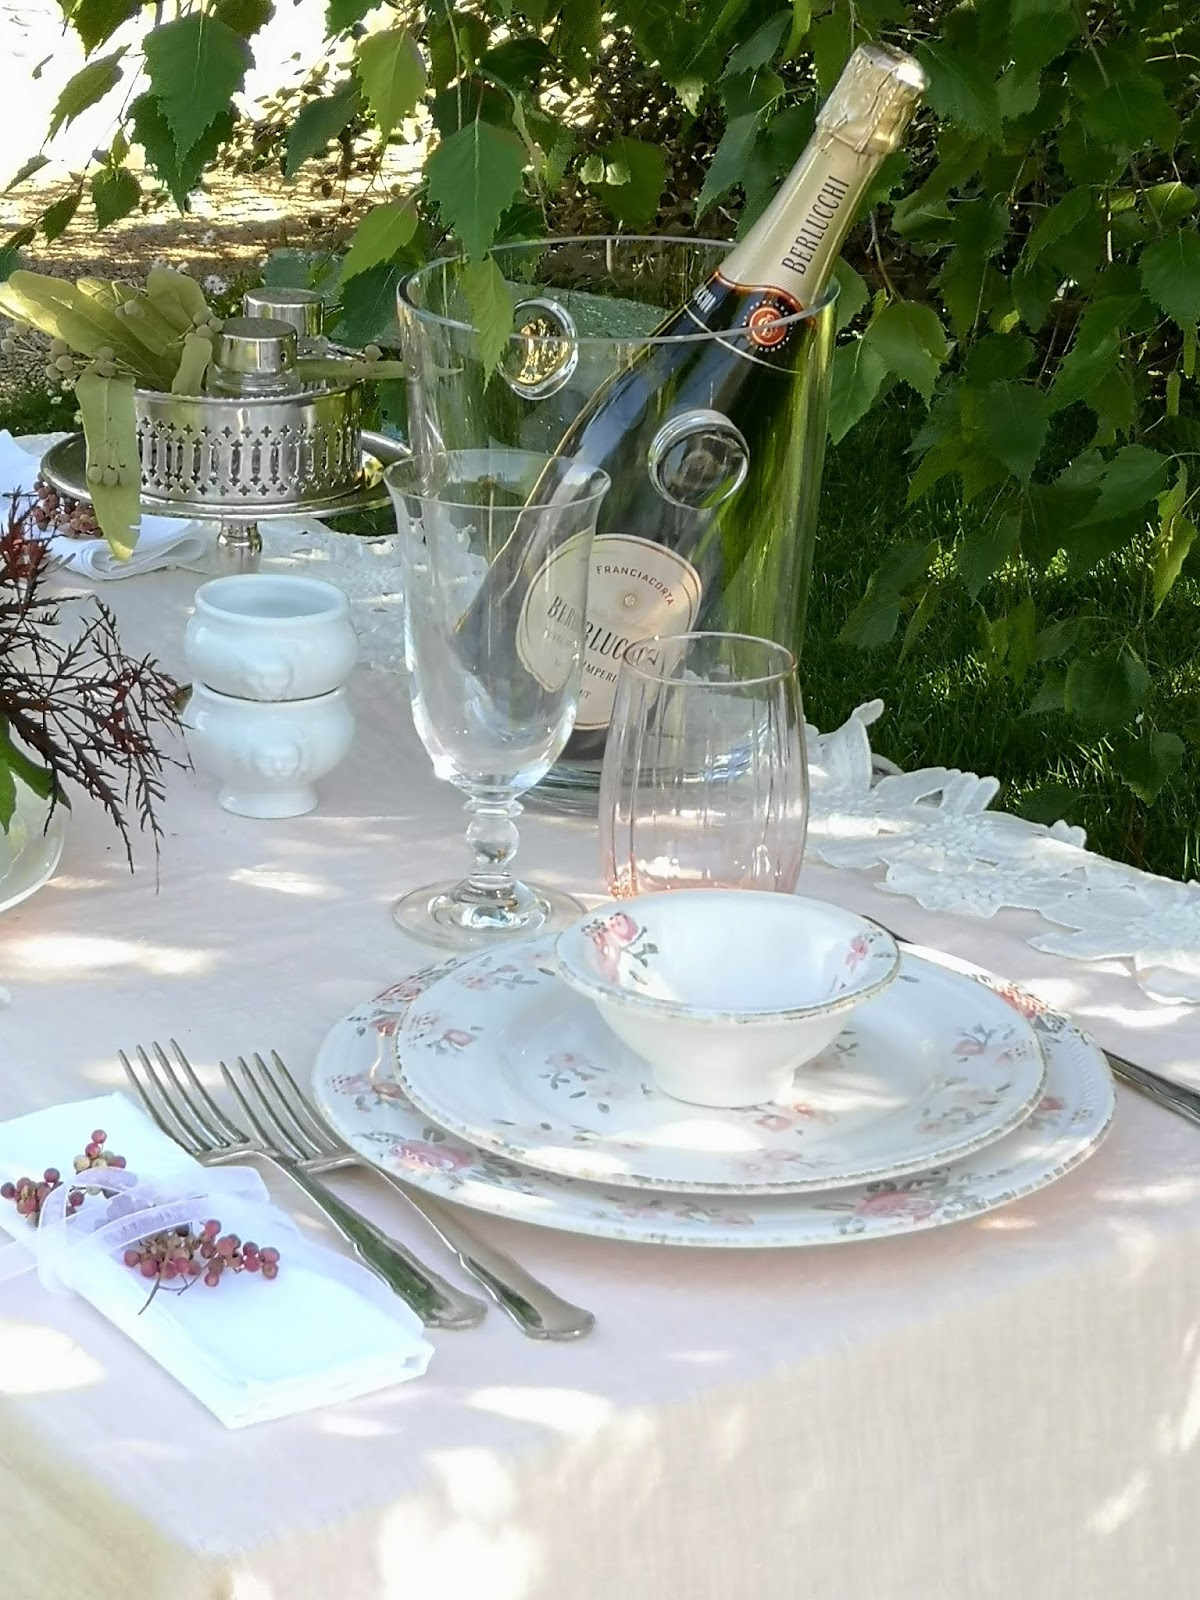 tavola romantica per due